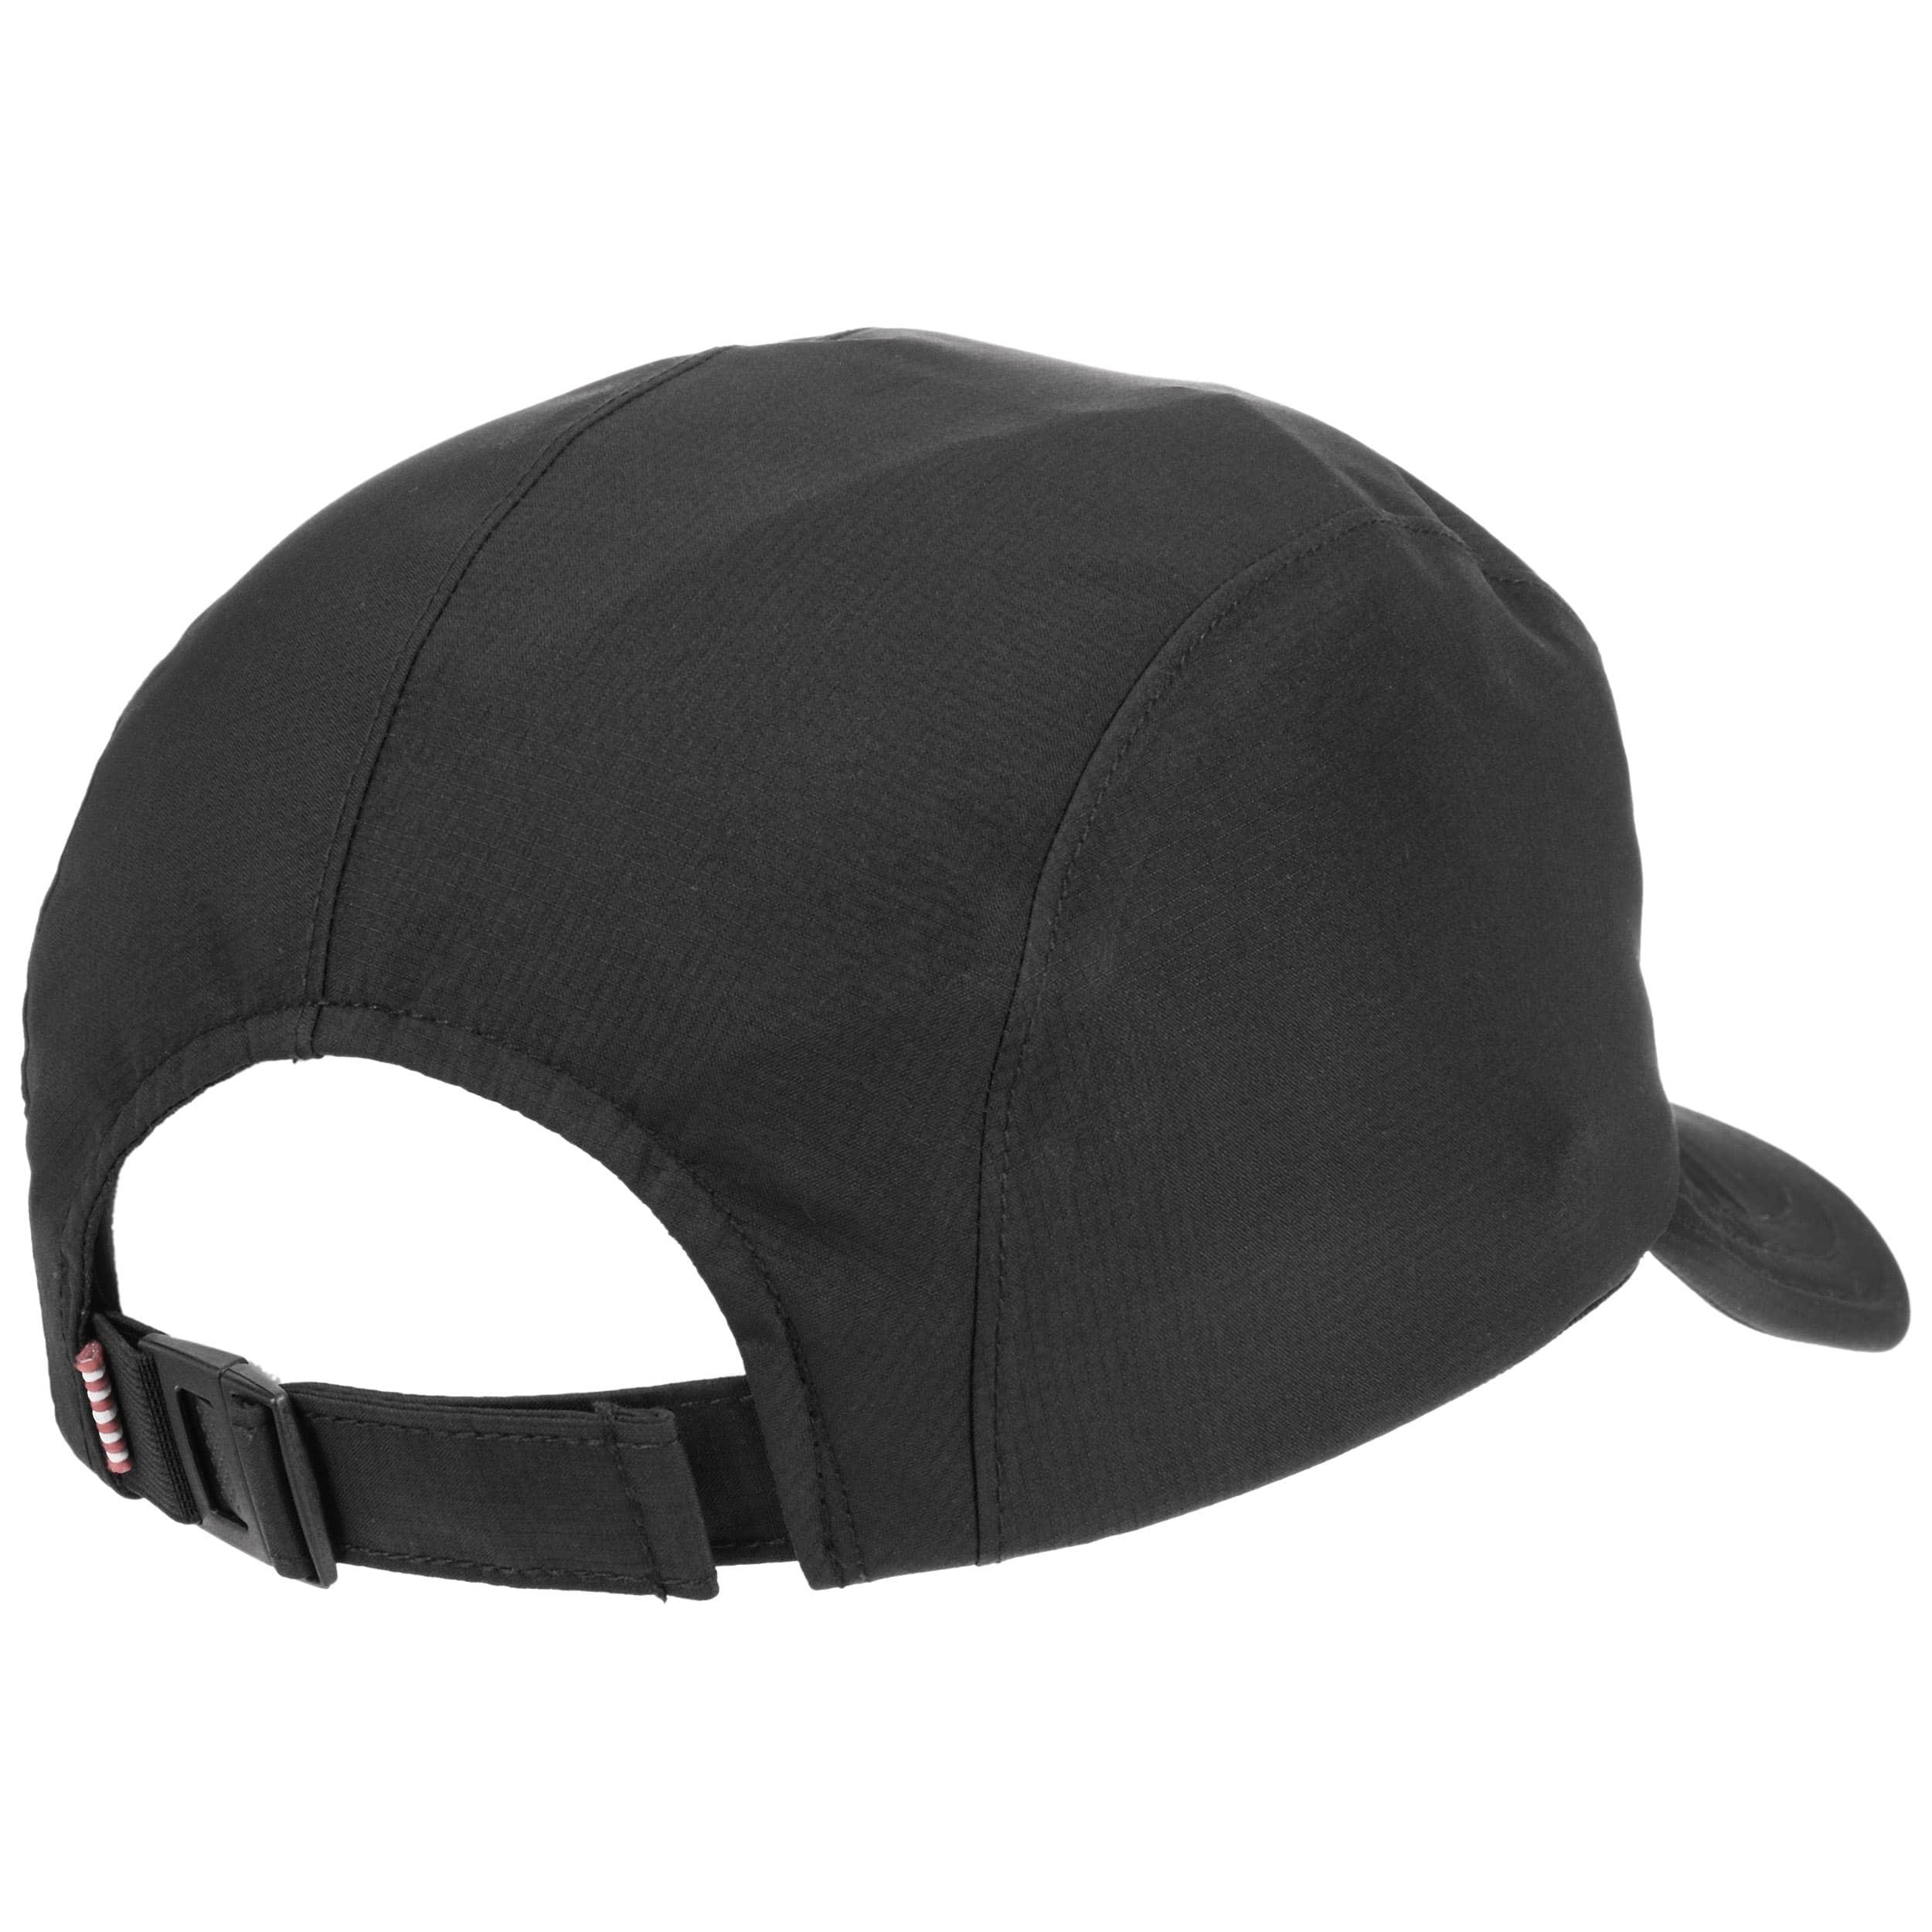 ... Glendale Gore-Tex Cap by Herschel - black 3 ... b417027b5a7d